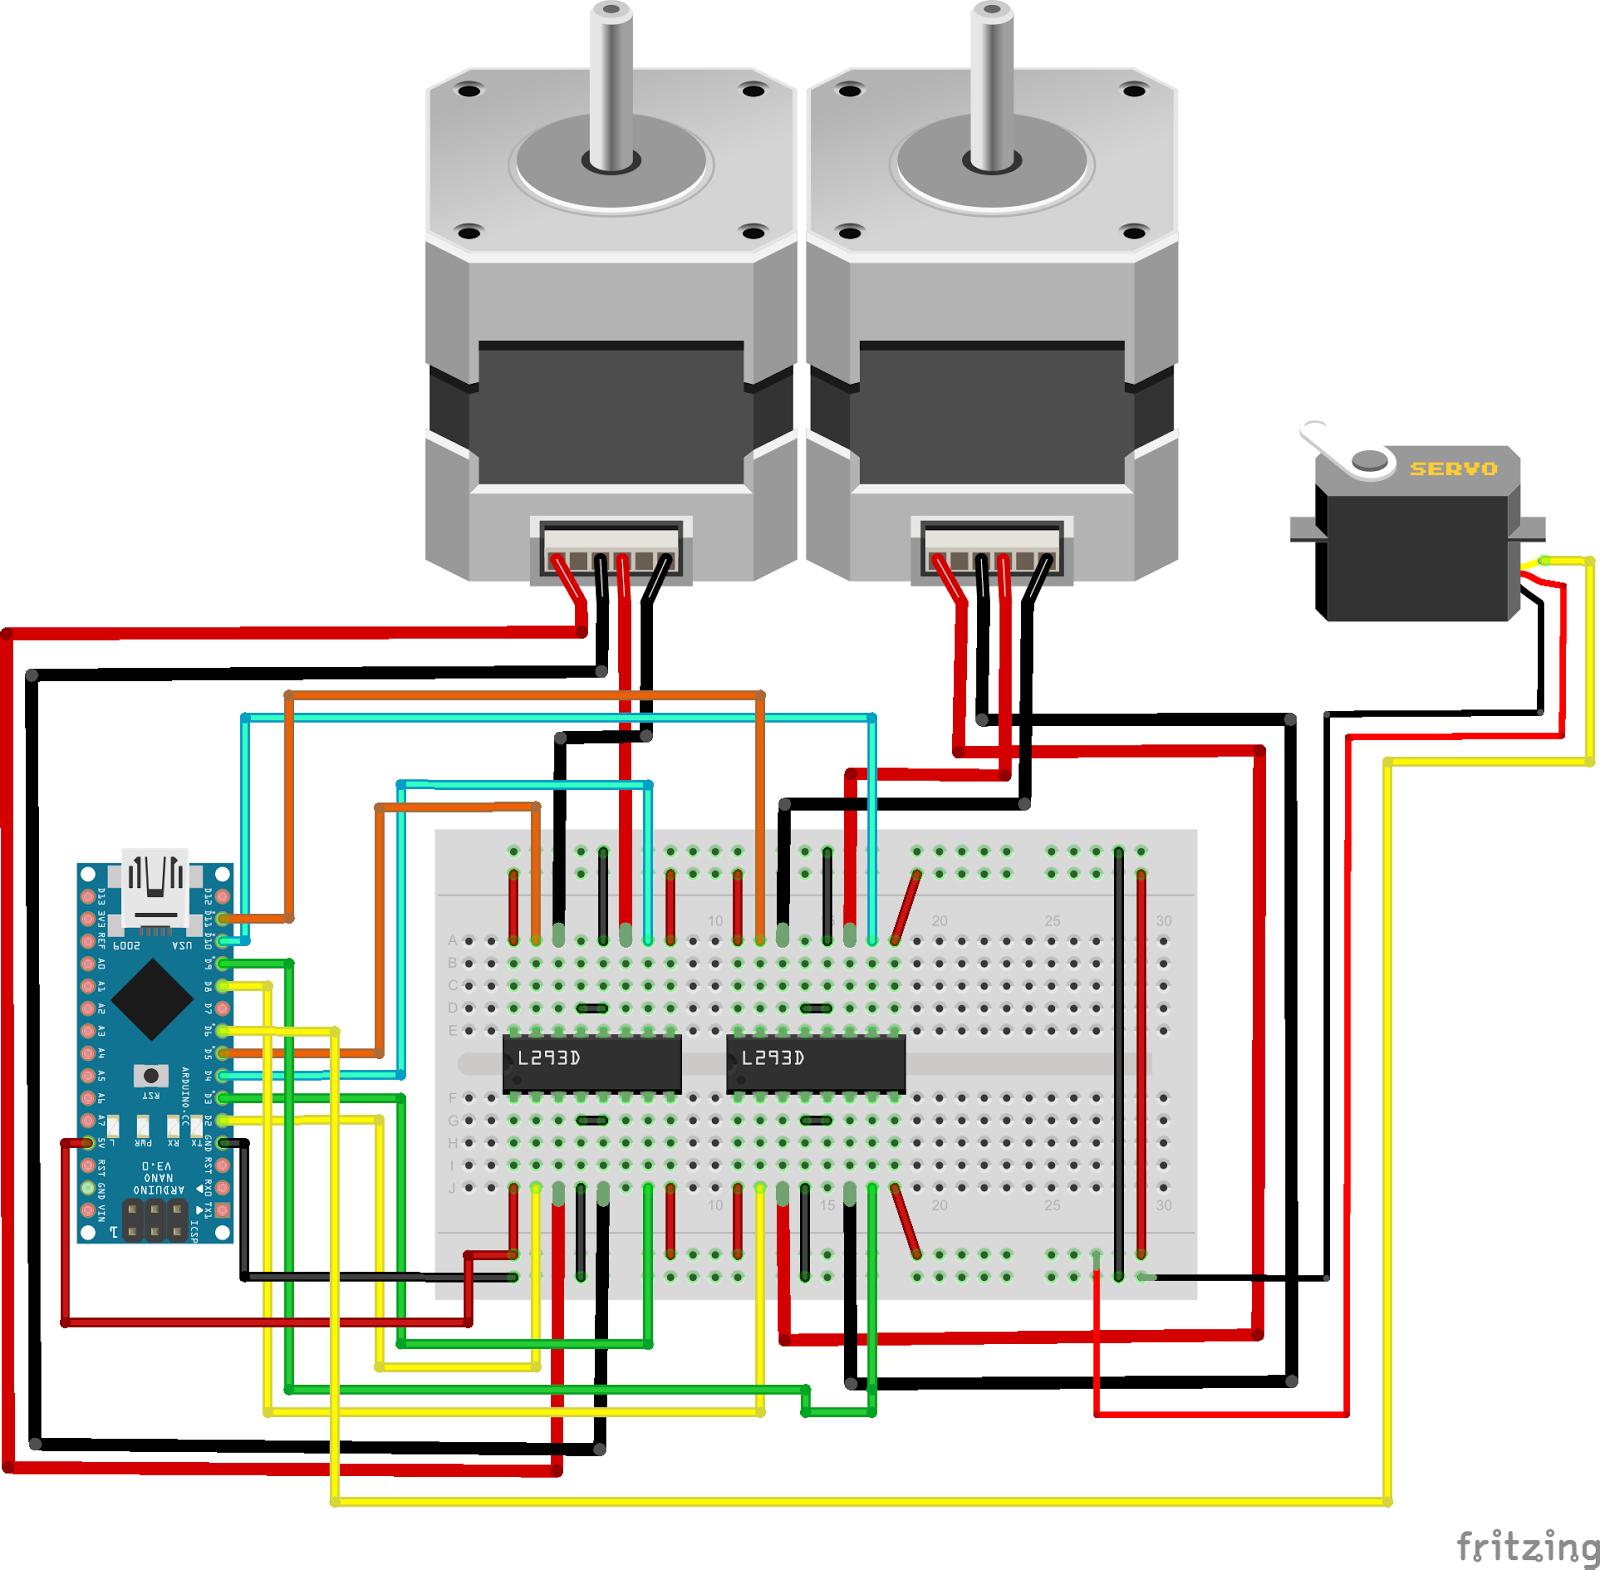 In Welcome To My Blog Tutorial Seputar Arduino Rc Merakit Dot Com Transmitters Atau Kalian Bisa Lihat Versi Fritzing